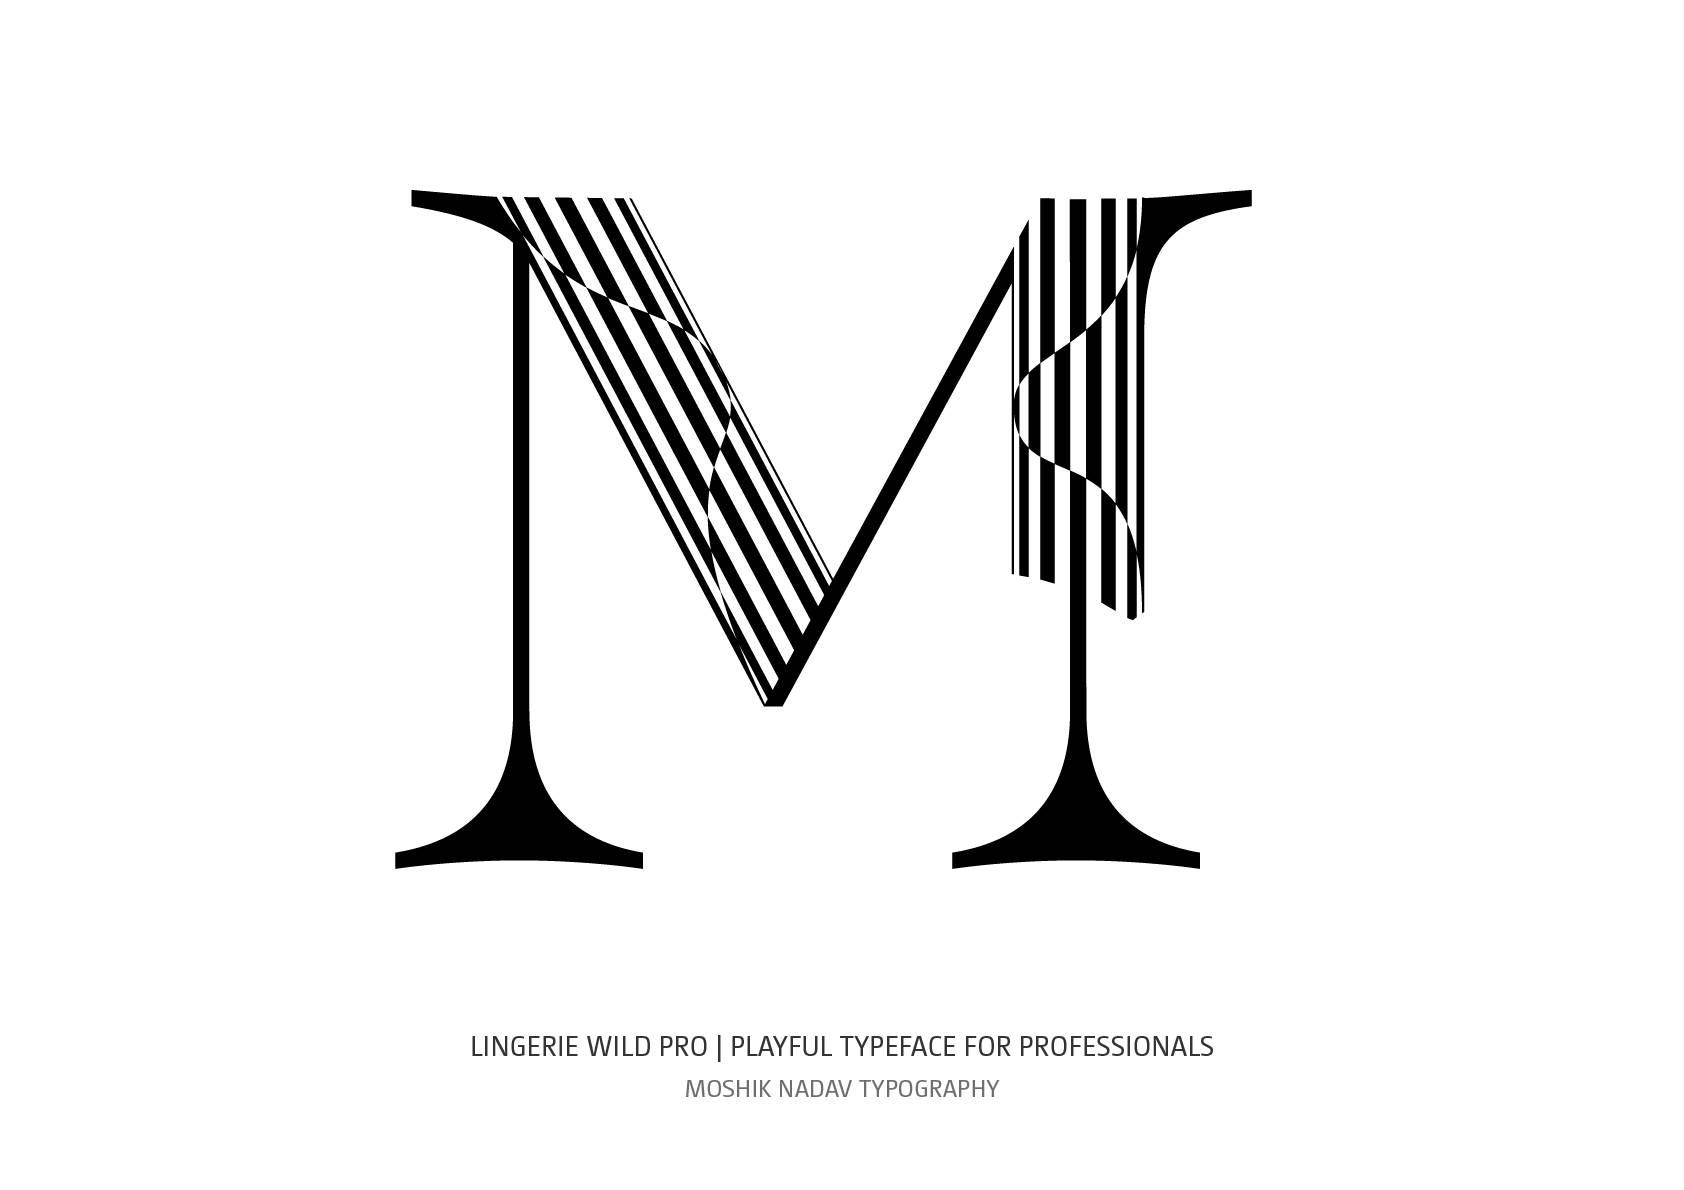 New Typeface by Moshik Nadav - Lingerie Wild Pro